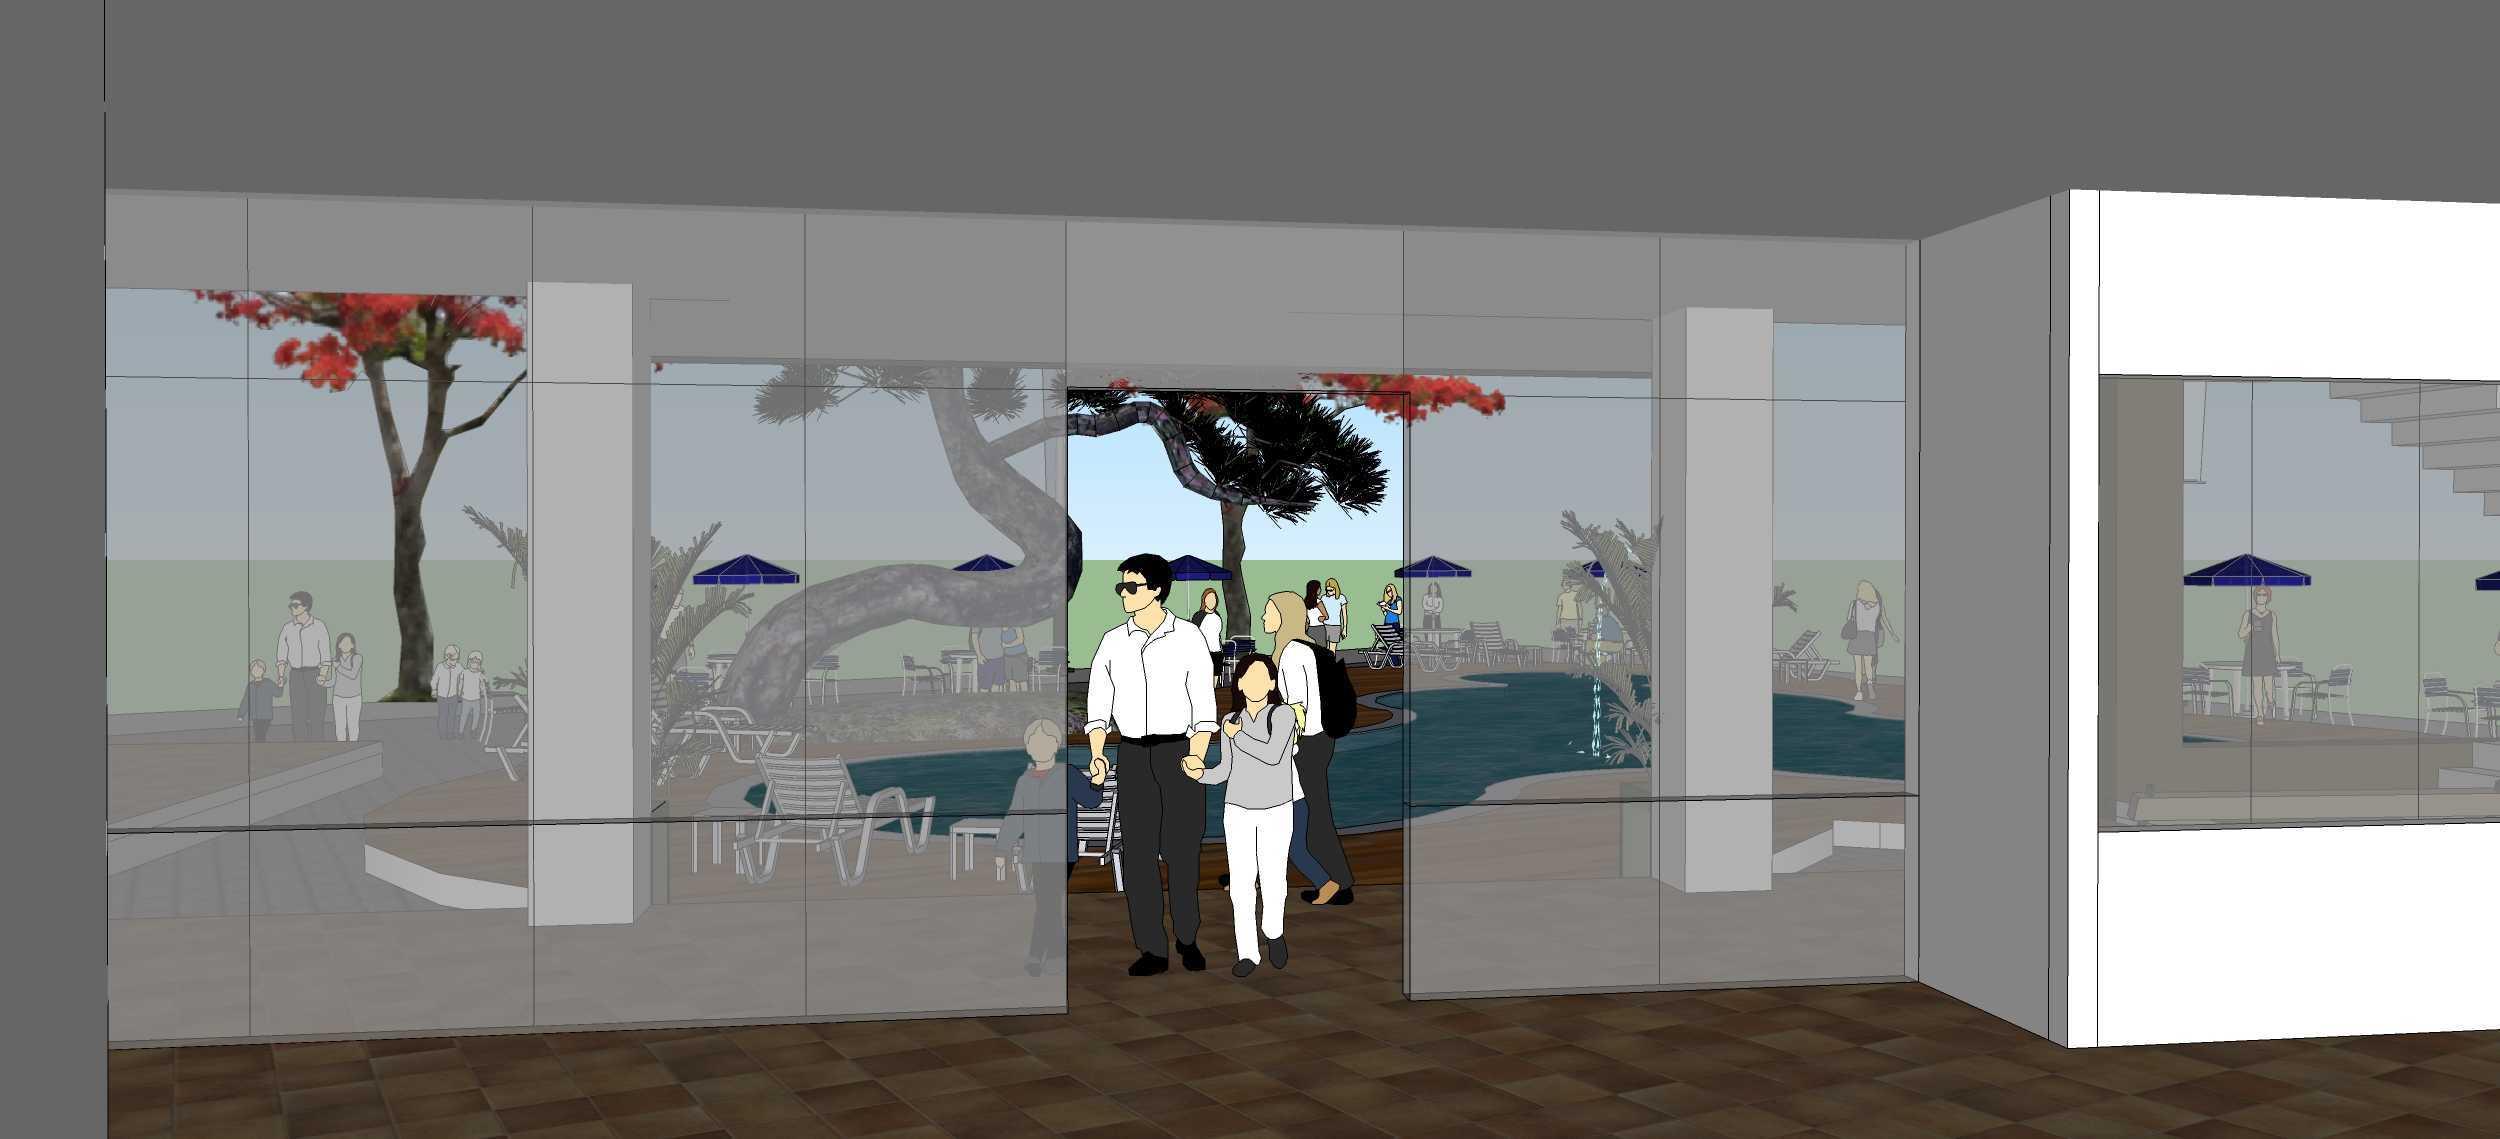 Wicaksono Pandyo Prasasto Hollywood Square Bogor, Jawa Barat Bogor, Jawa Barat Club-House-10   27013